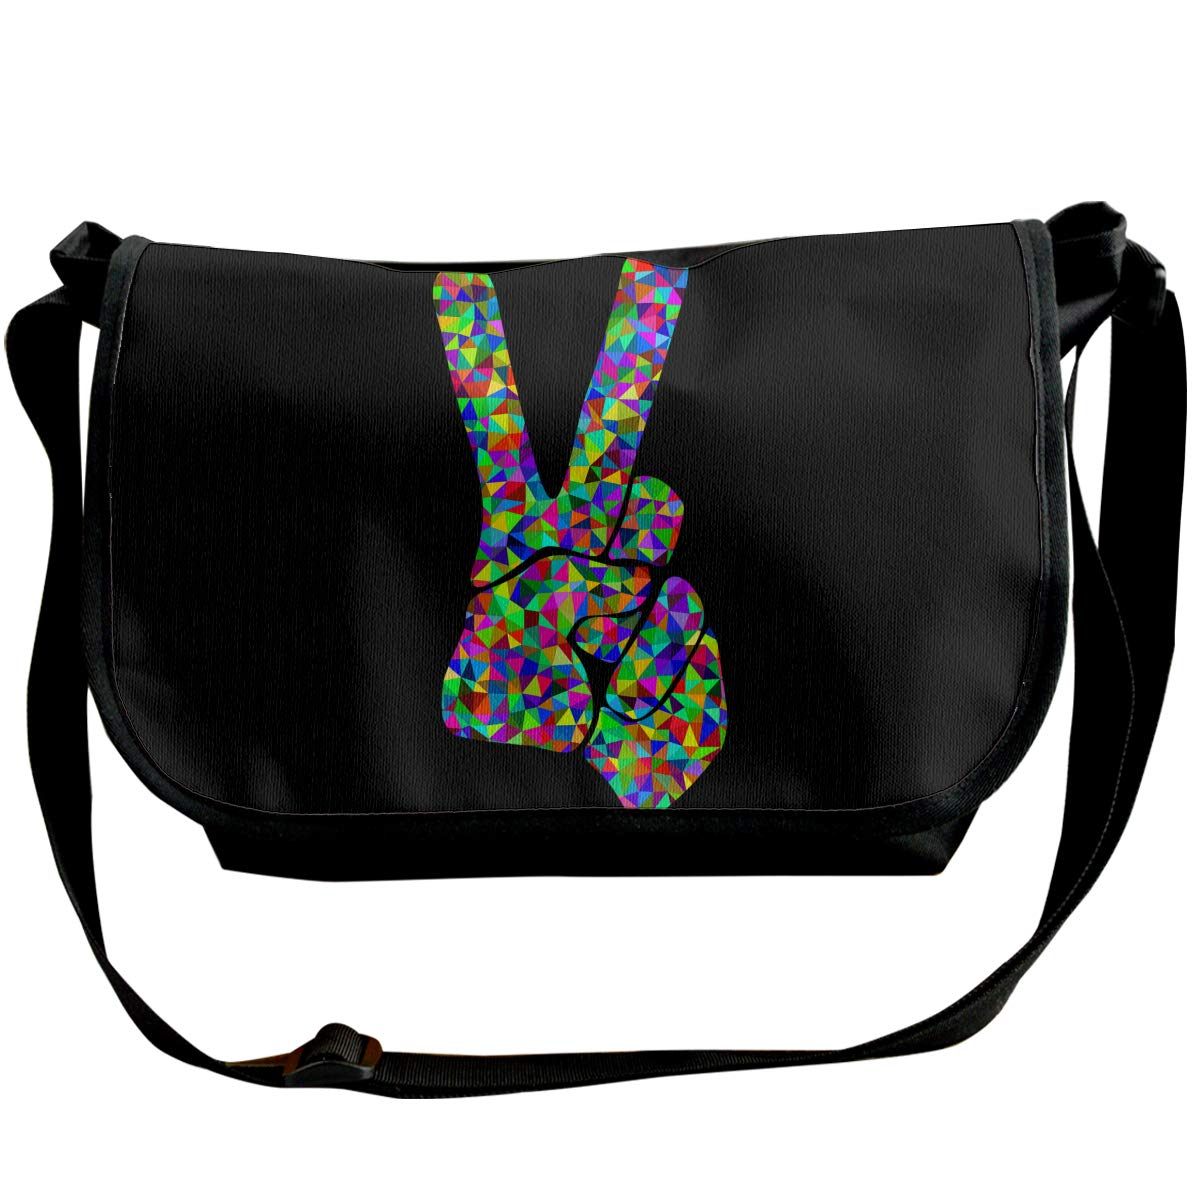 Futong Huaxia Victory Hand Gesture V Hand Gesture Travel Messenger Bags Handbag Shoulder Bag Crossbody Bag Unisex